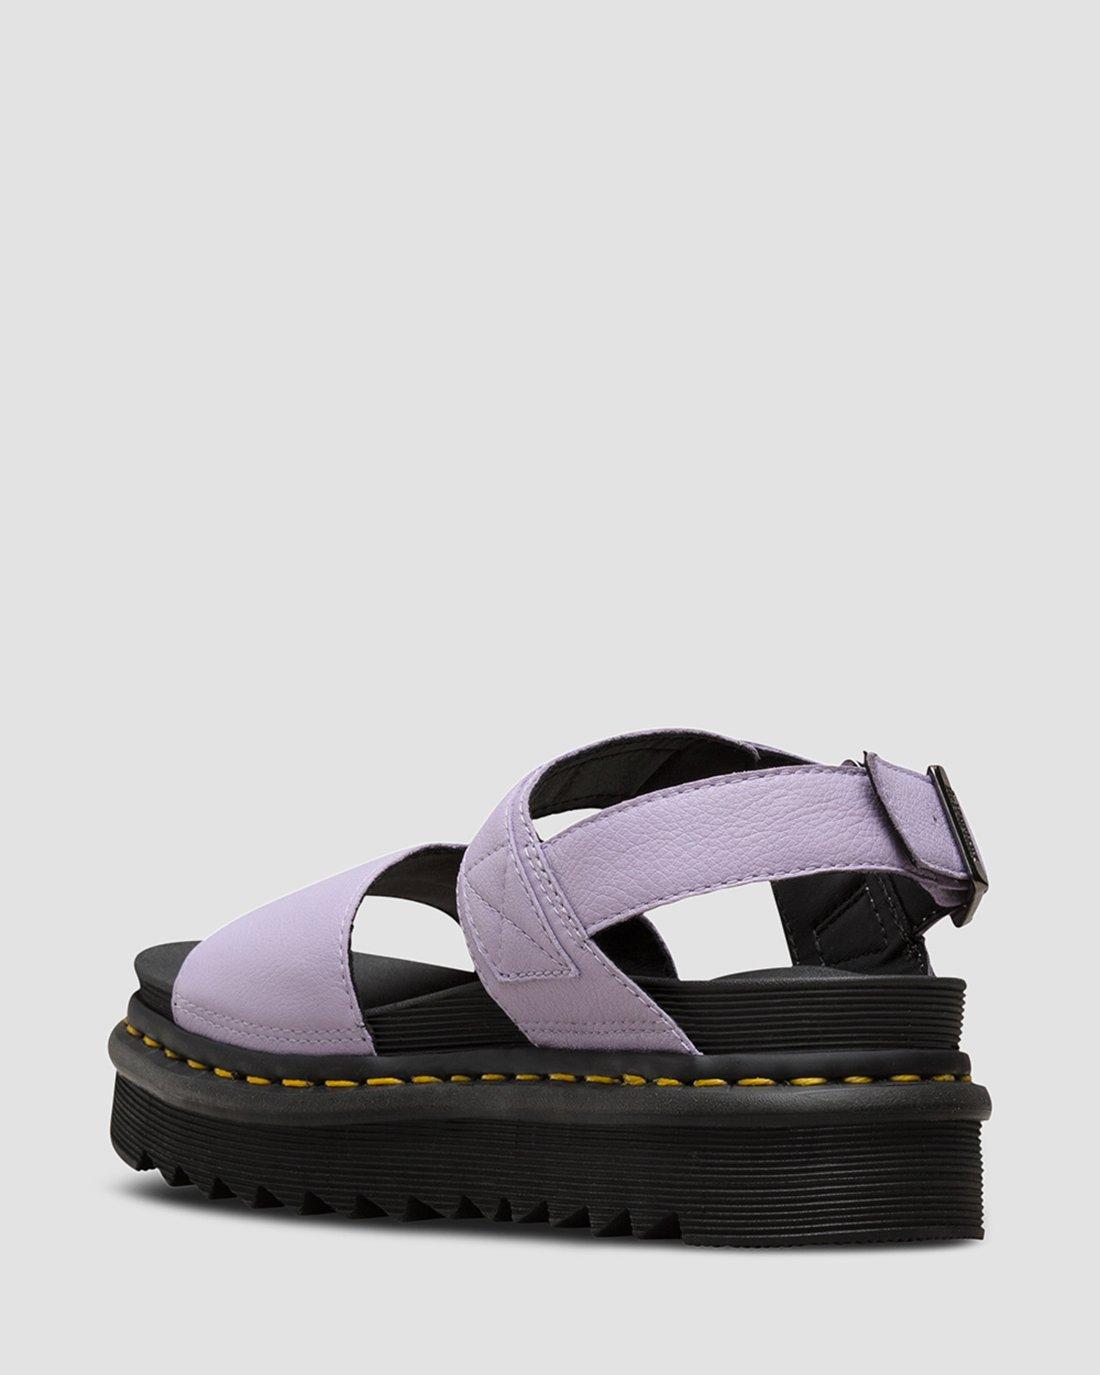 Sandales pour femme | Sandales | The Official FR Dr Martens